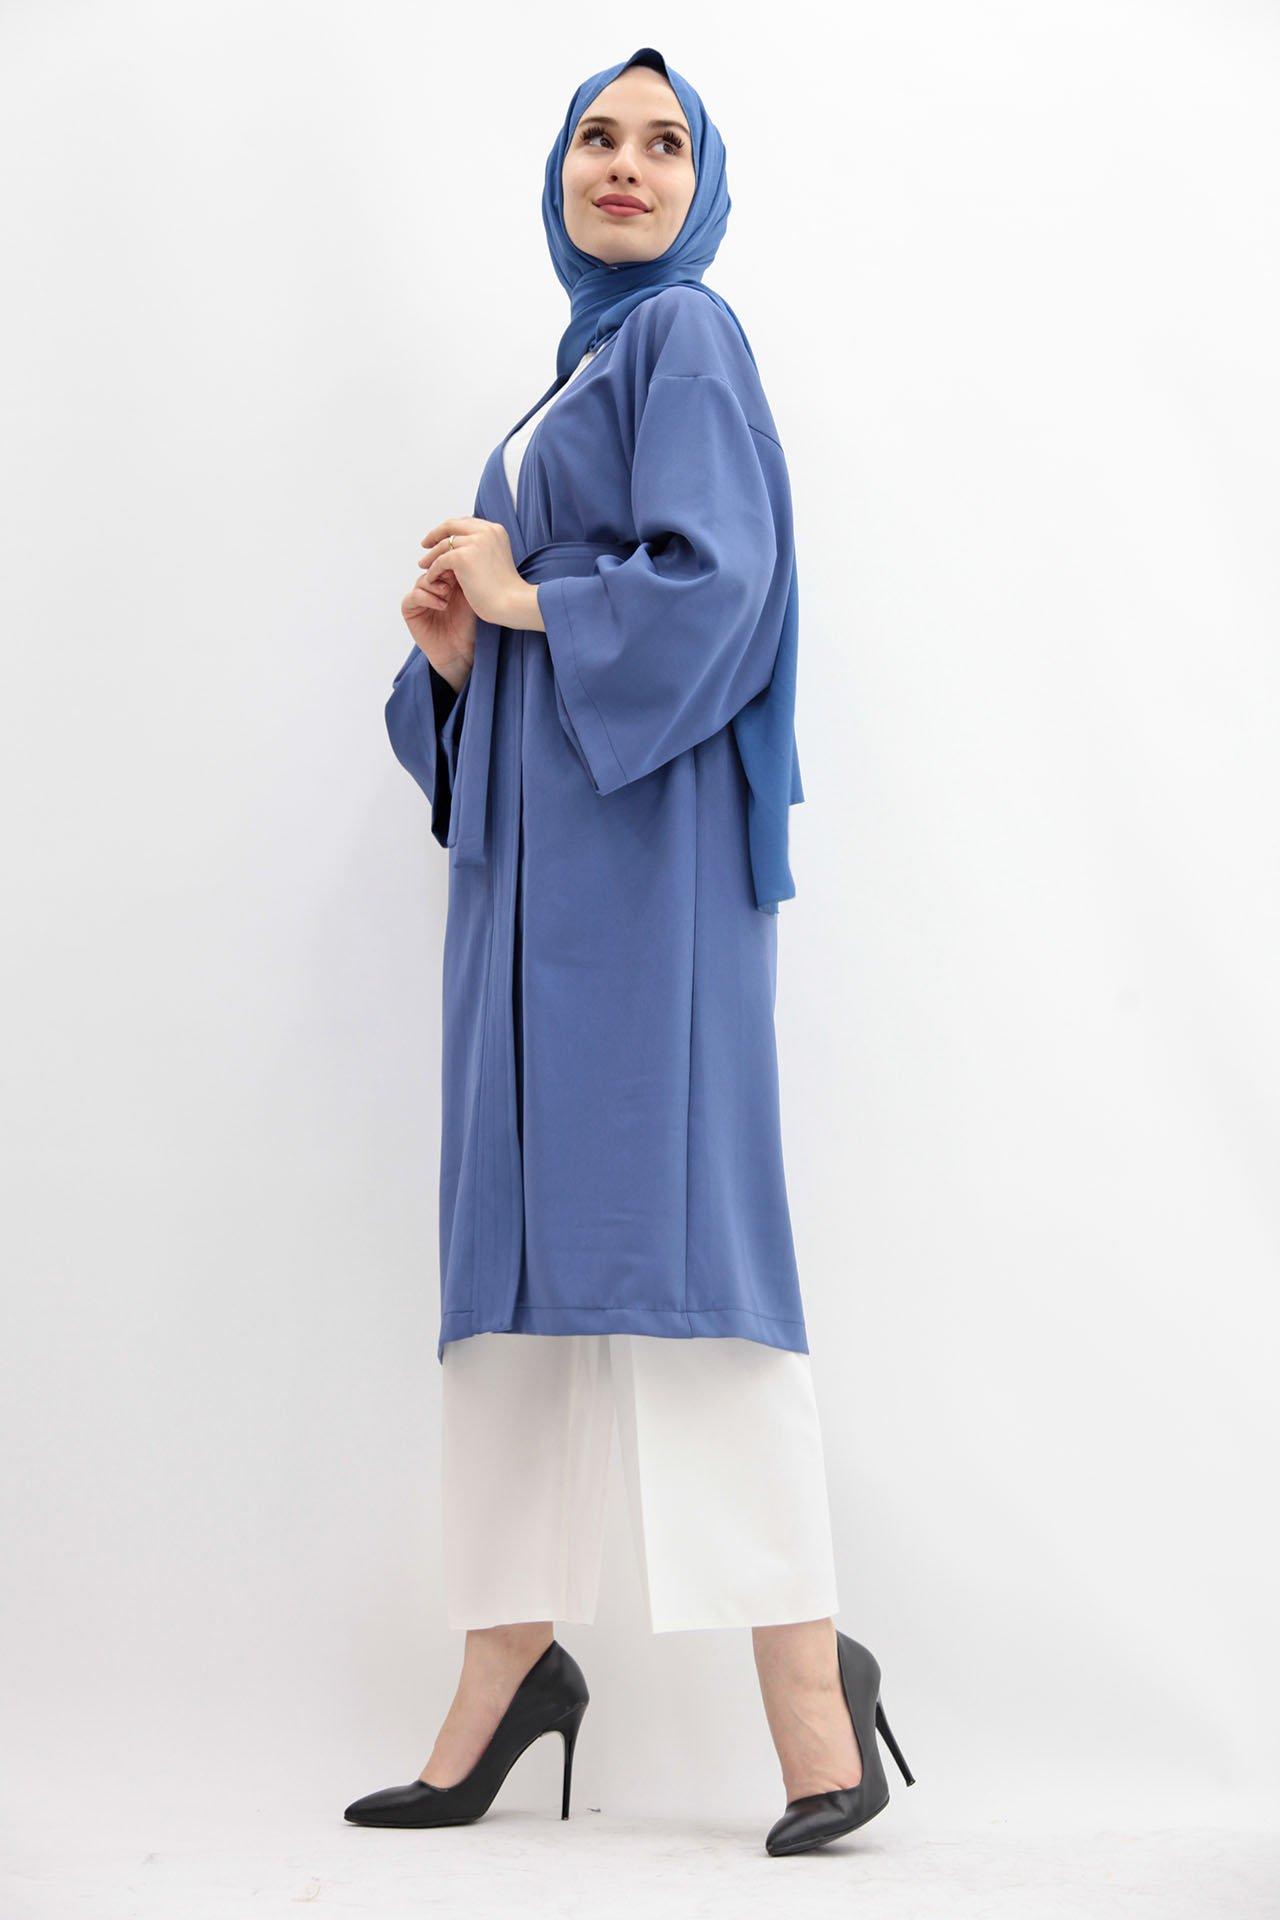 GİZAGİYİM - Kuşaklı Kimono İndigo